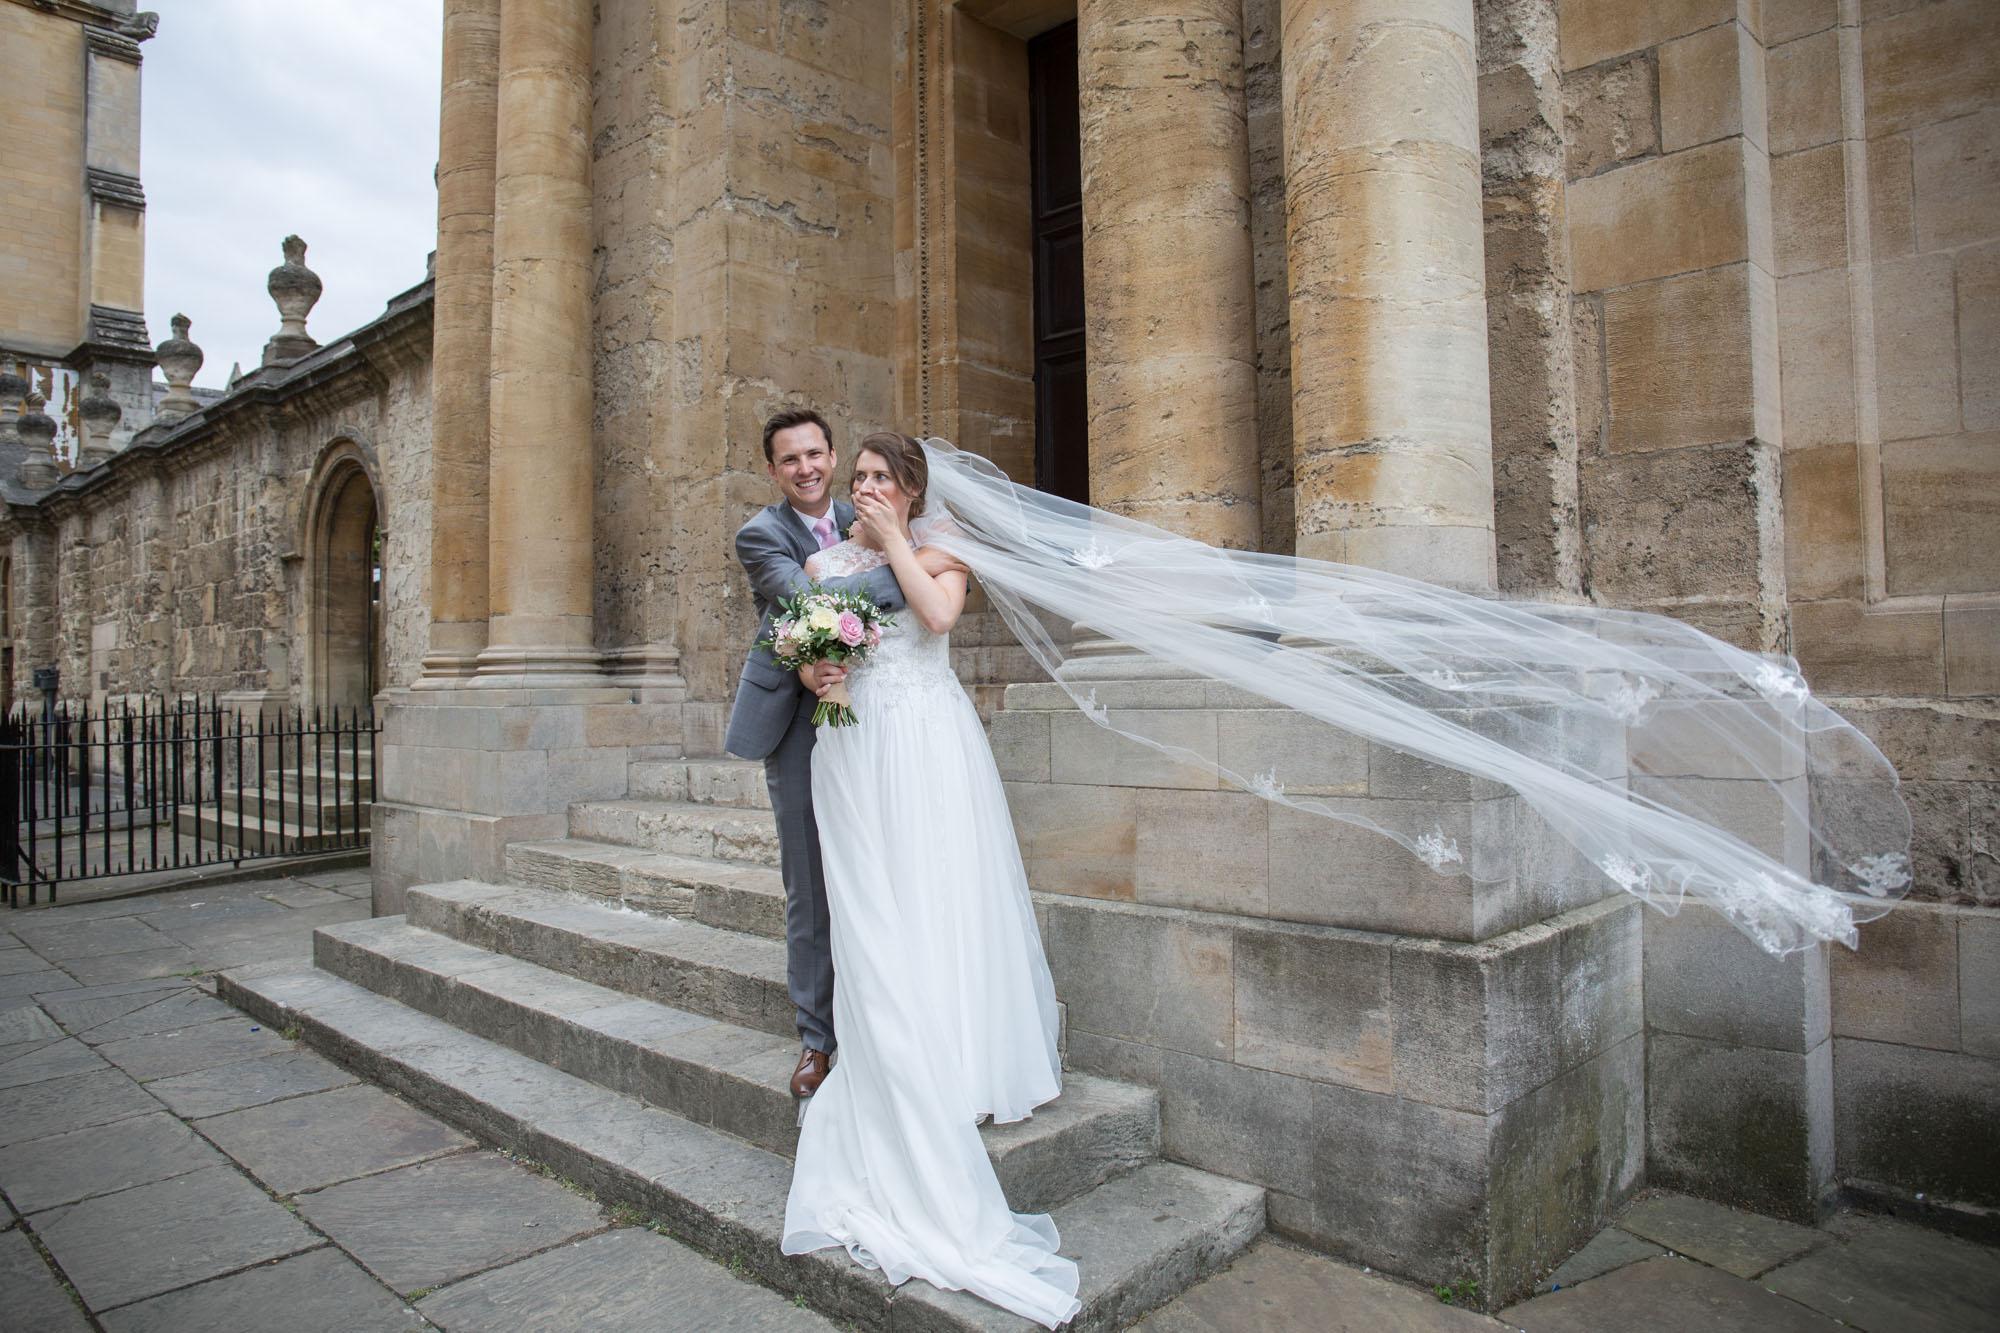 weddings-couples-love-photographer-oxford-london-jonathan-self-photography-67.jpg